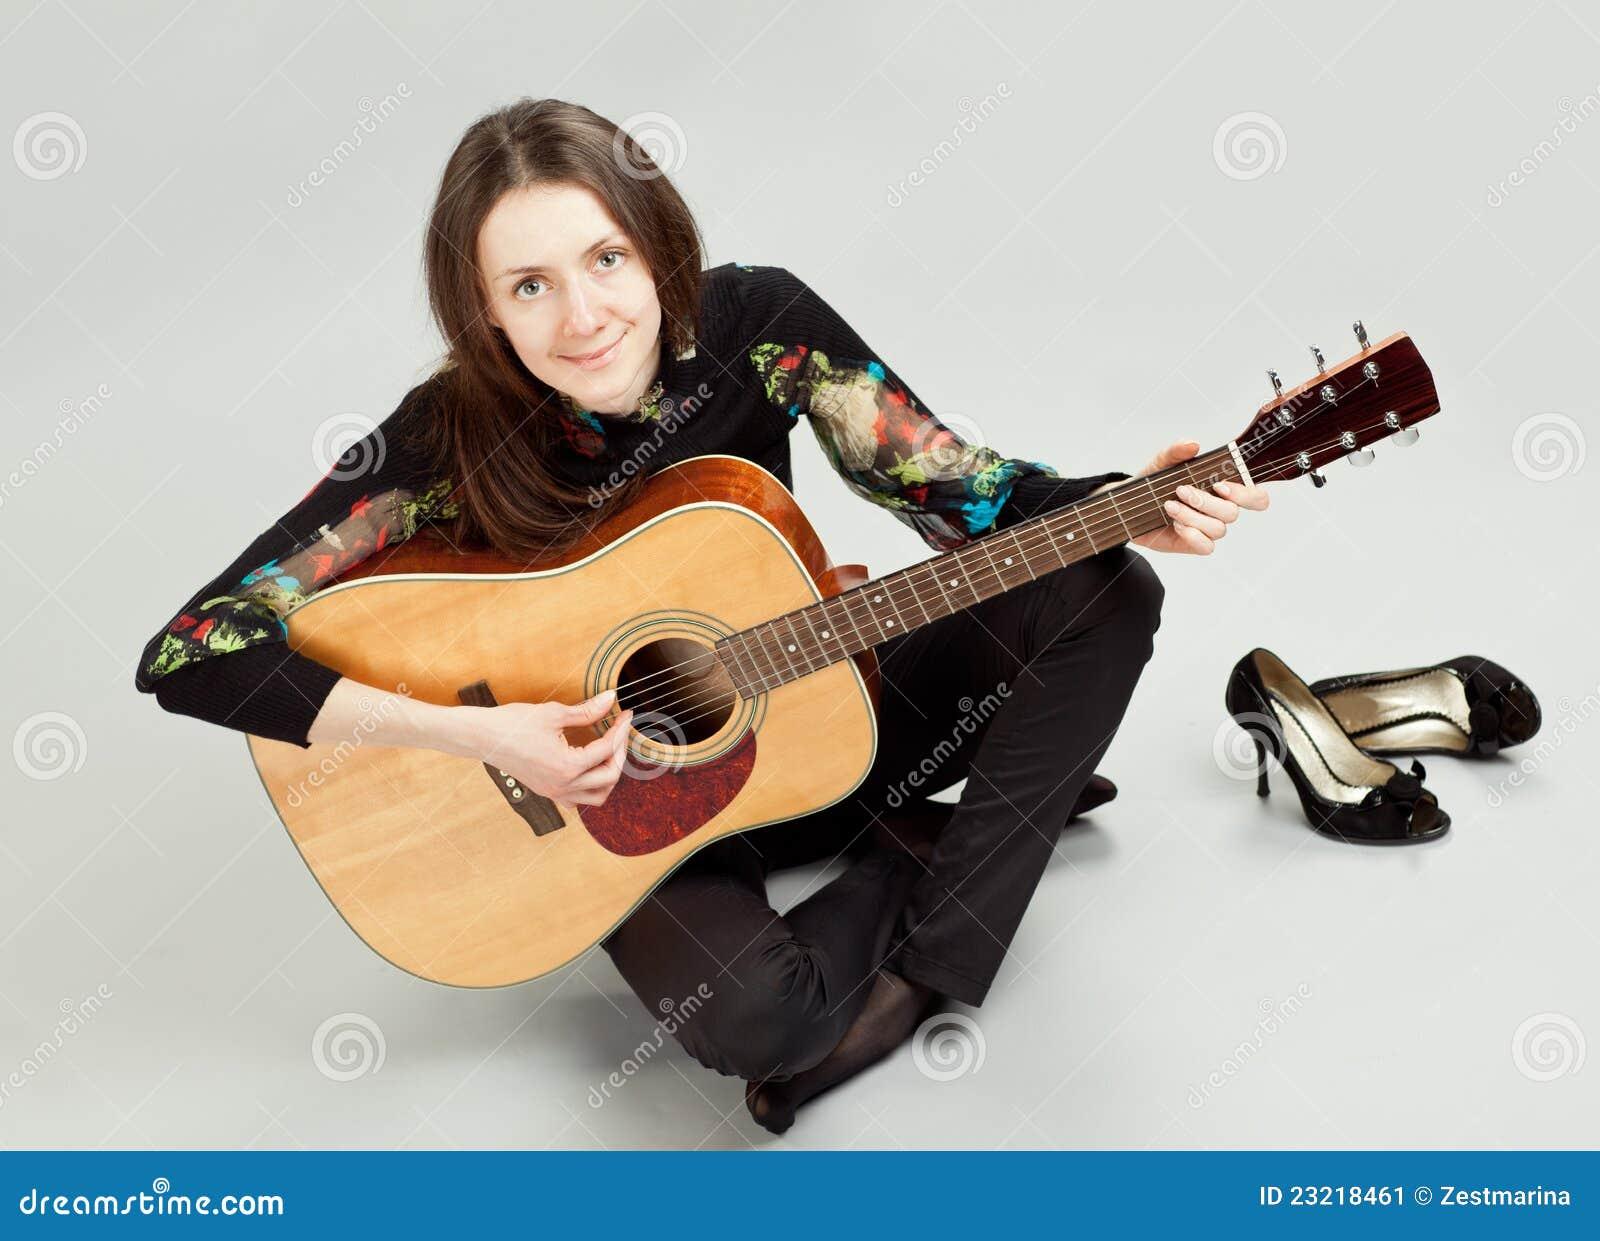 Dating girl who playing guitar